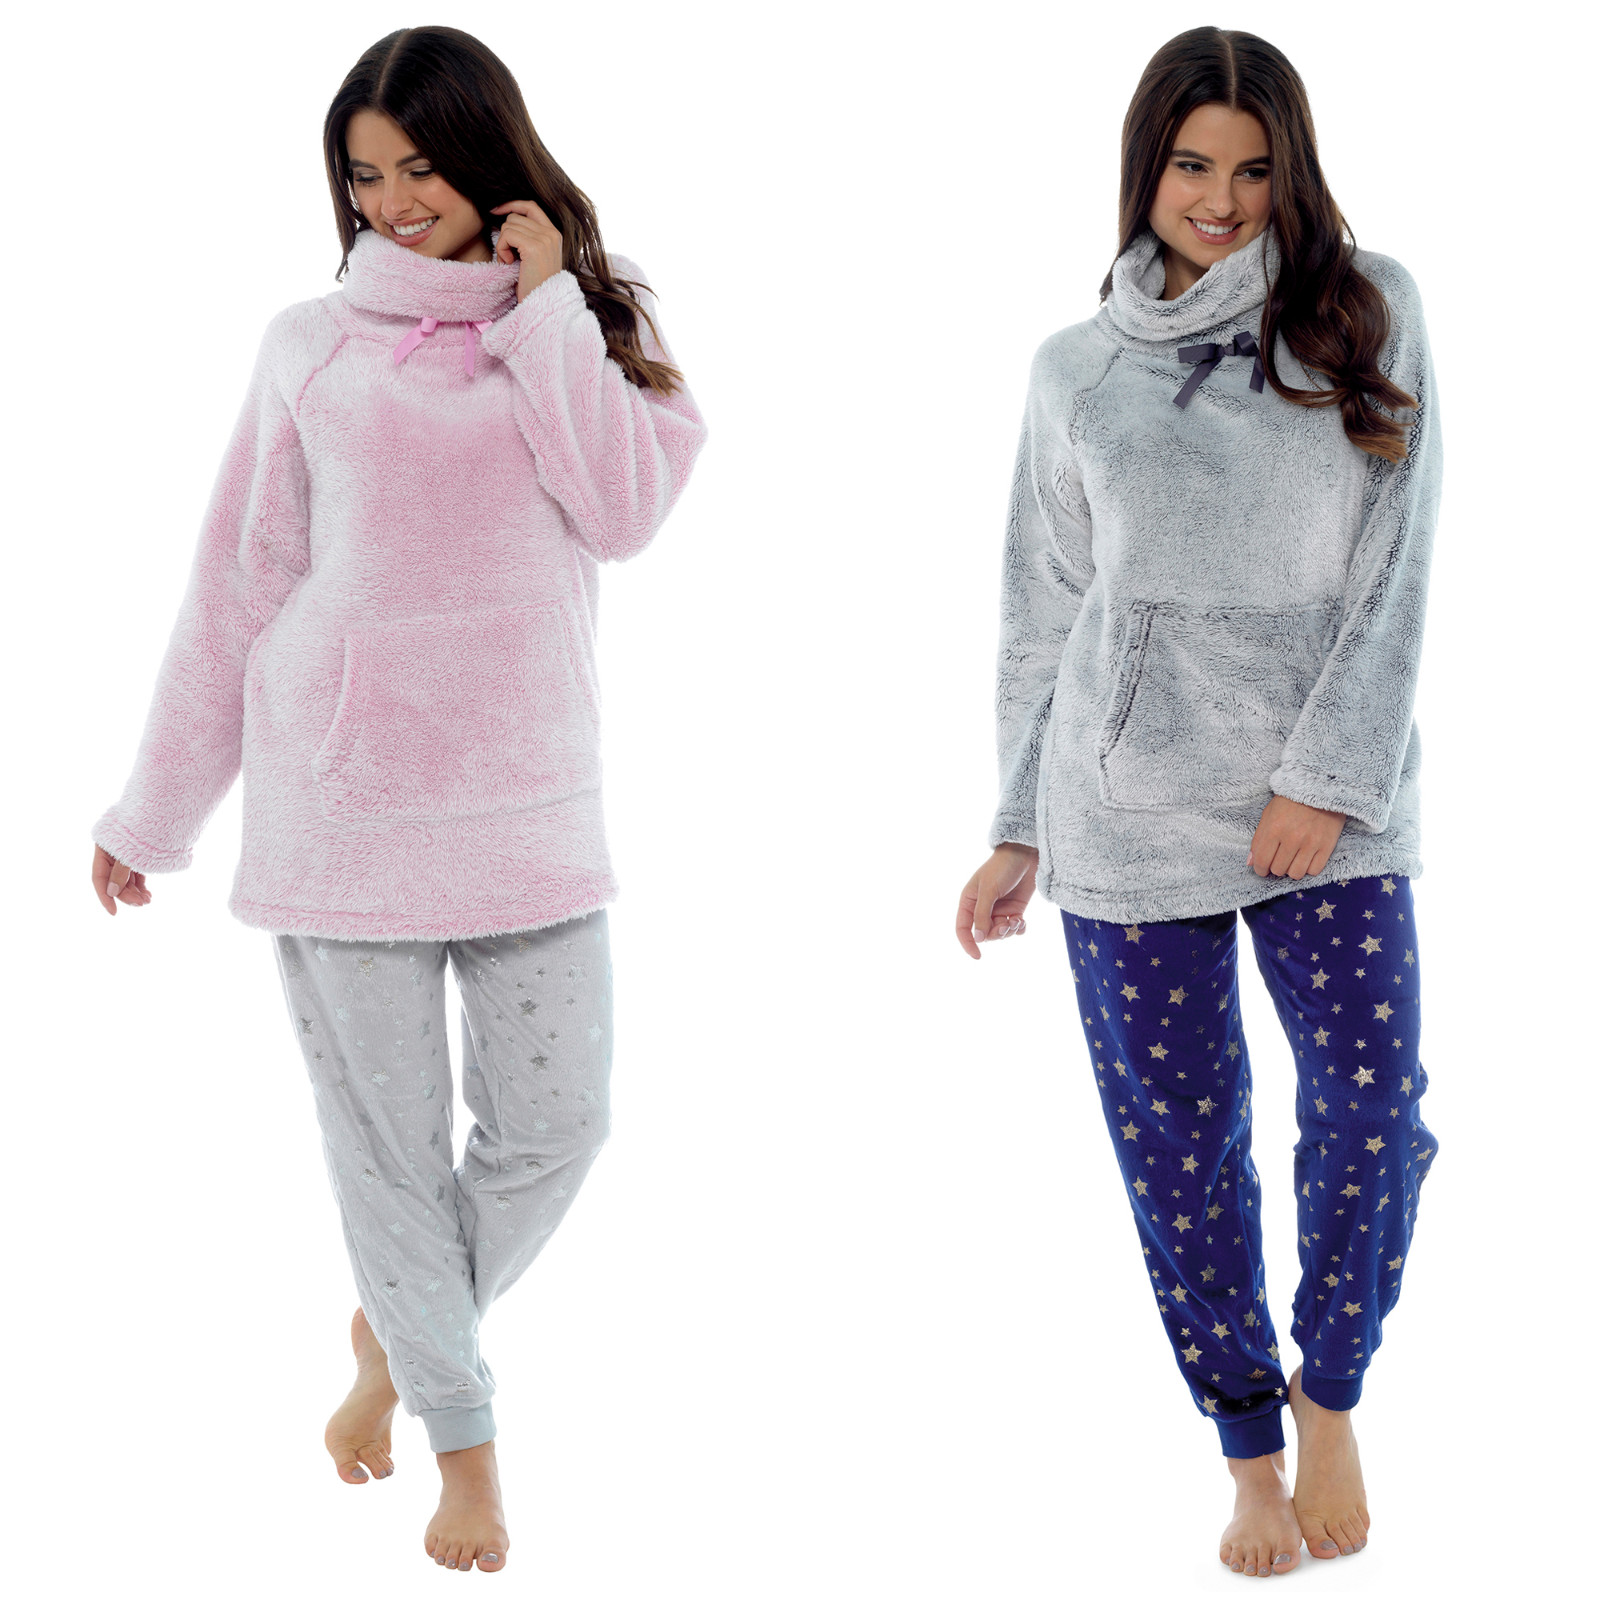 Womens Snuggle Fleece Cowl Neck Top Cuddle Jumper Lounge